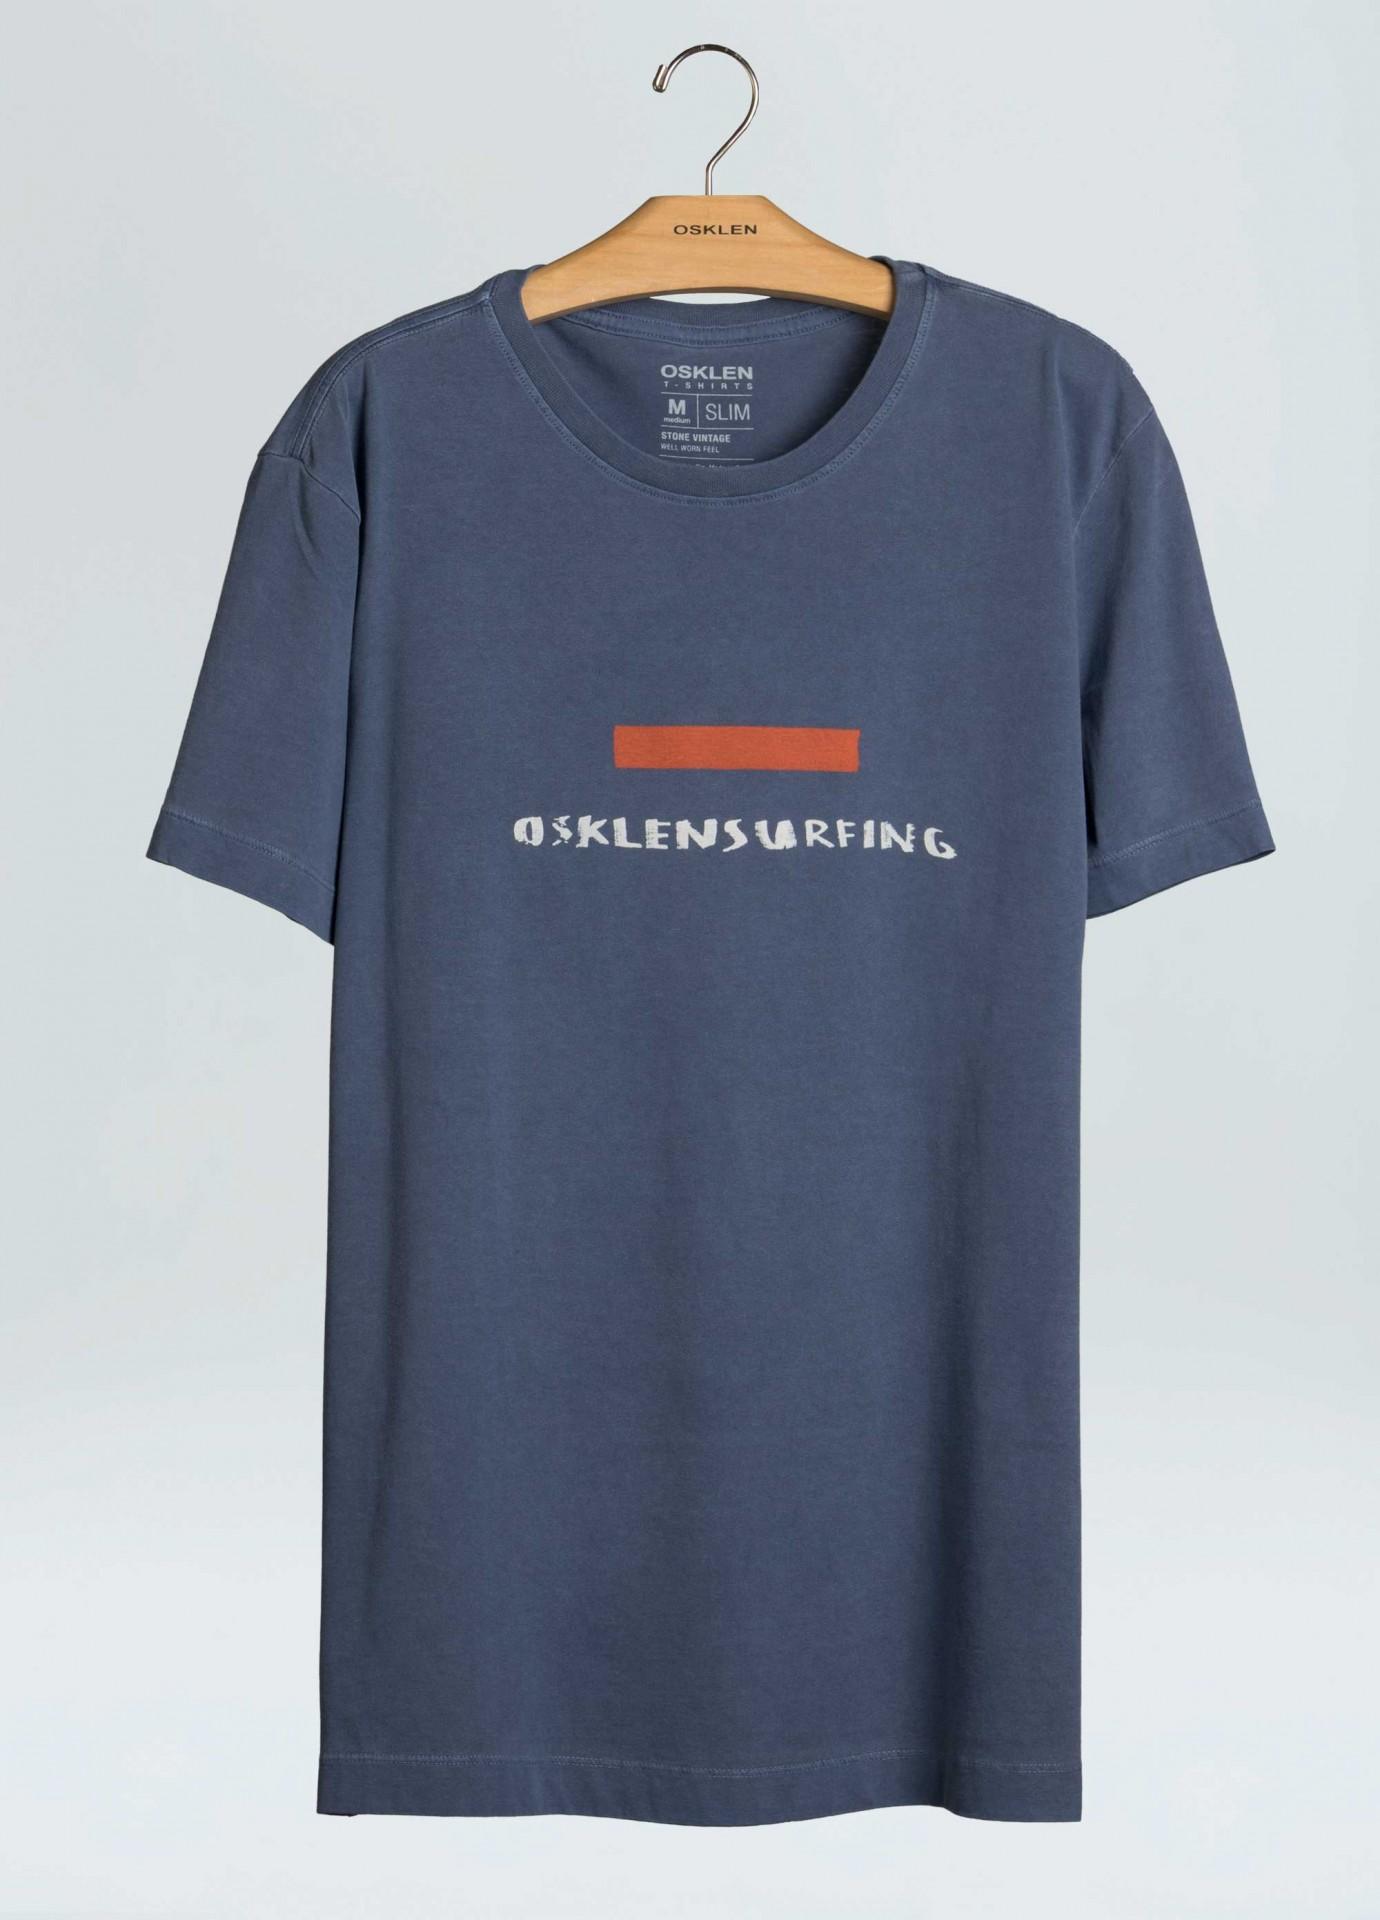 T-Shirt Stone Vintage Osklen Srfng Tape